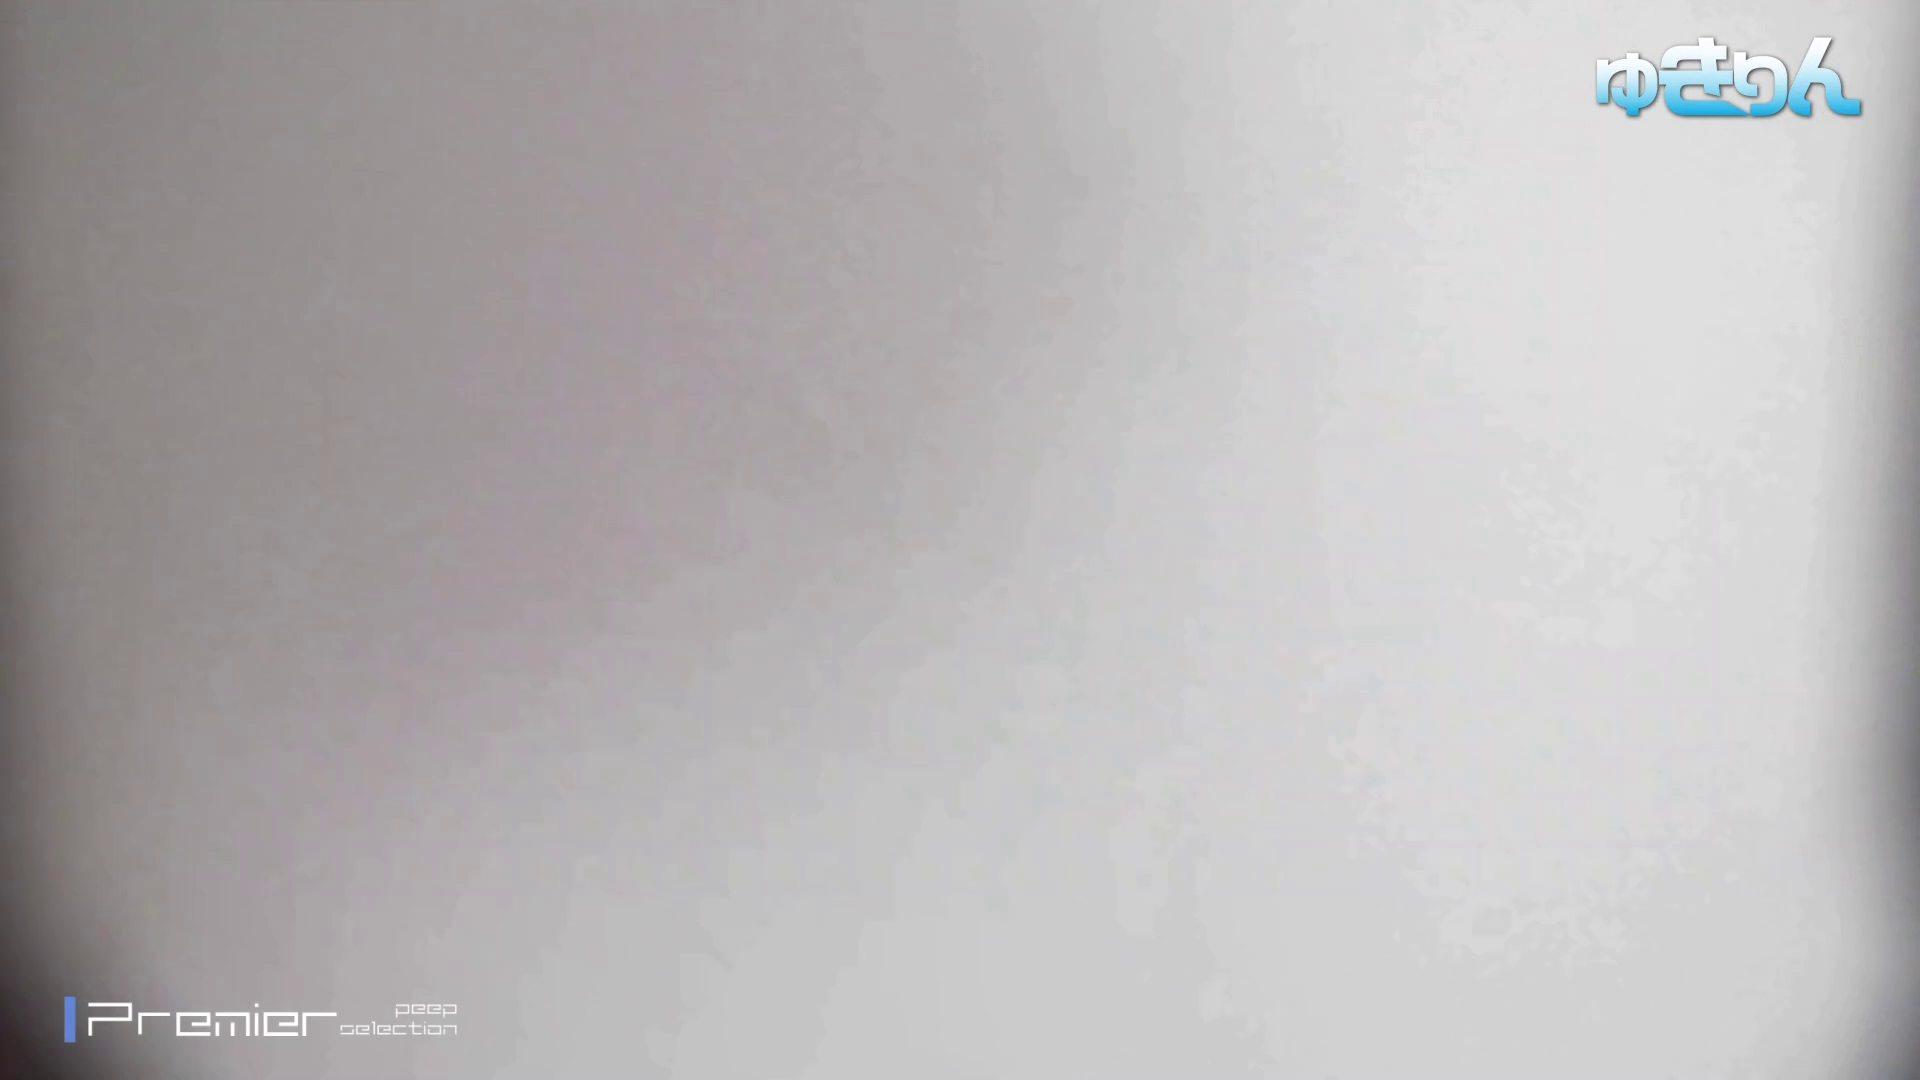 cm友達同士三人グループの二人を同時に捕獲【新世界の射窓からNo120】 高画質 AV動画キャプチャ 80枚 62